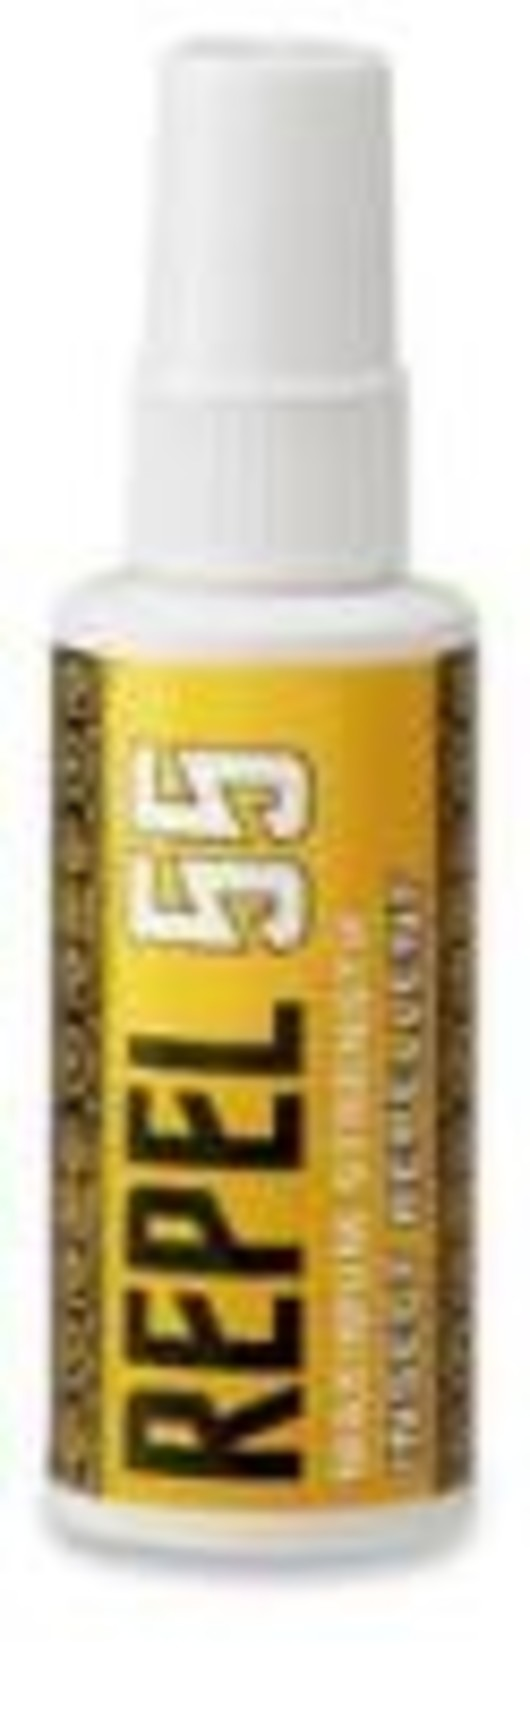 Repel 55 Insect Repellent